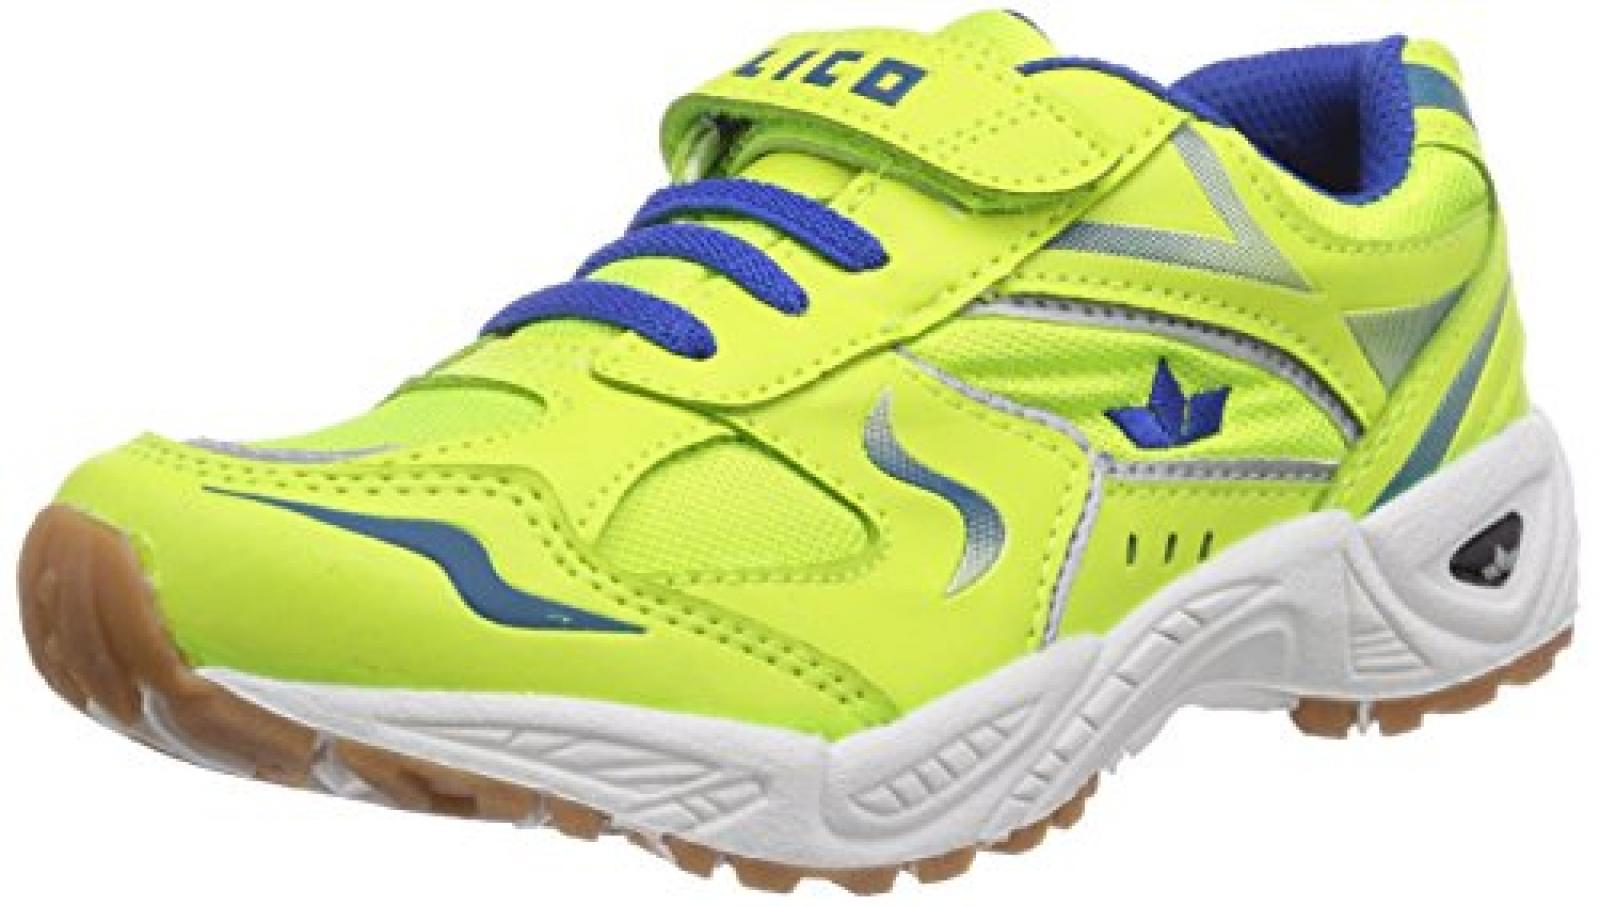 Lico Bob VS 360423 Unisex-Kinder Hallenschuhe Neongelb / Blau